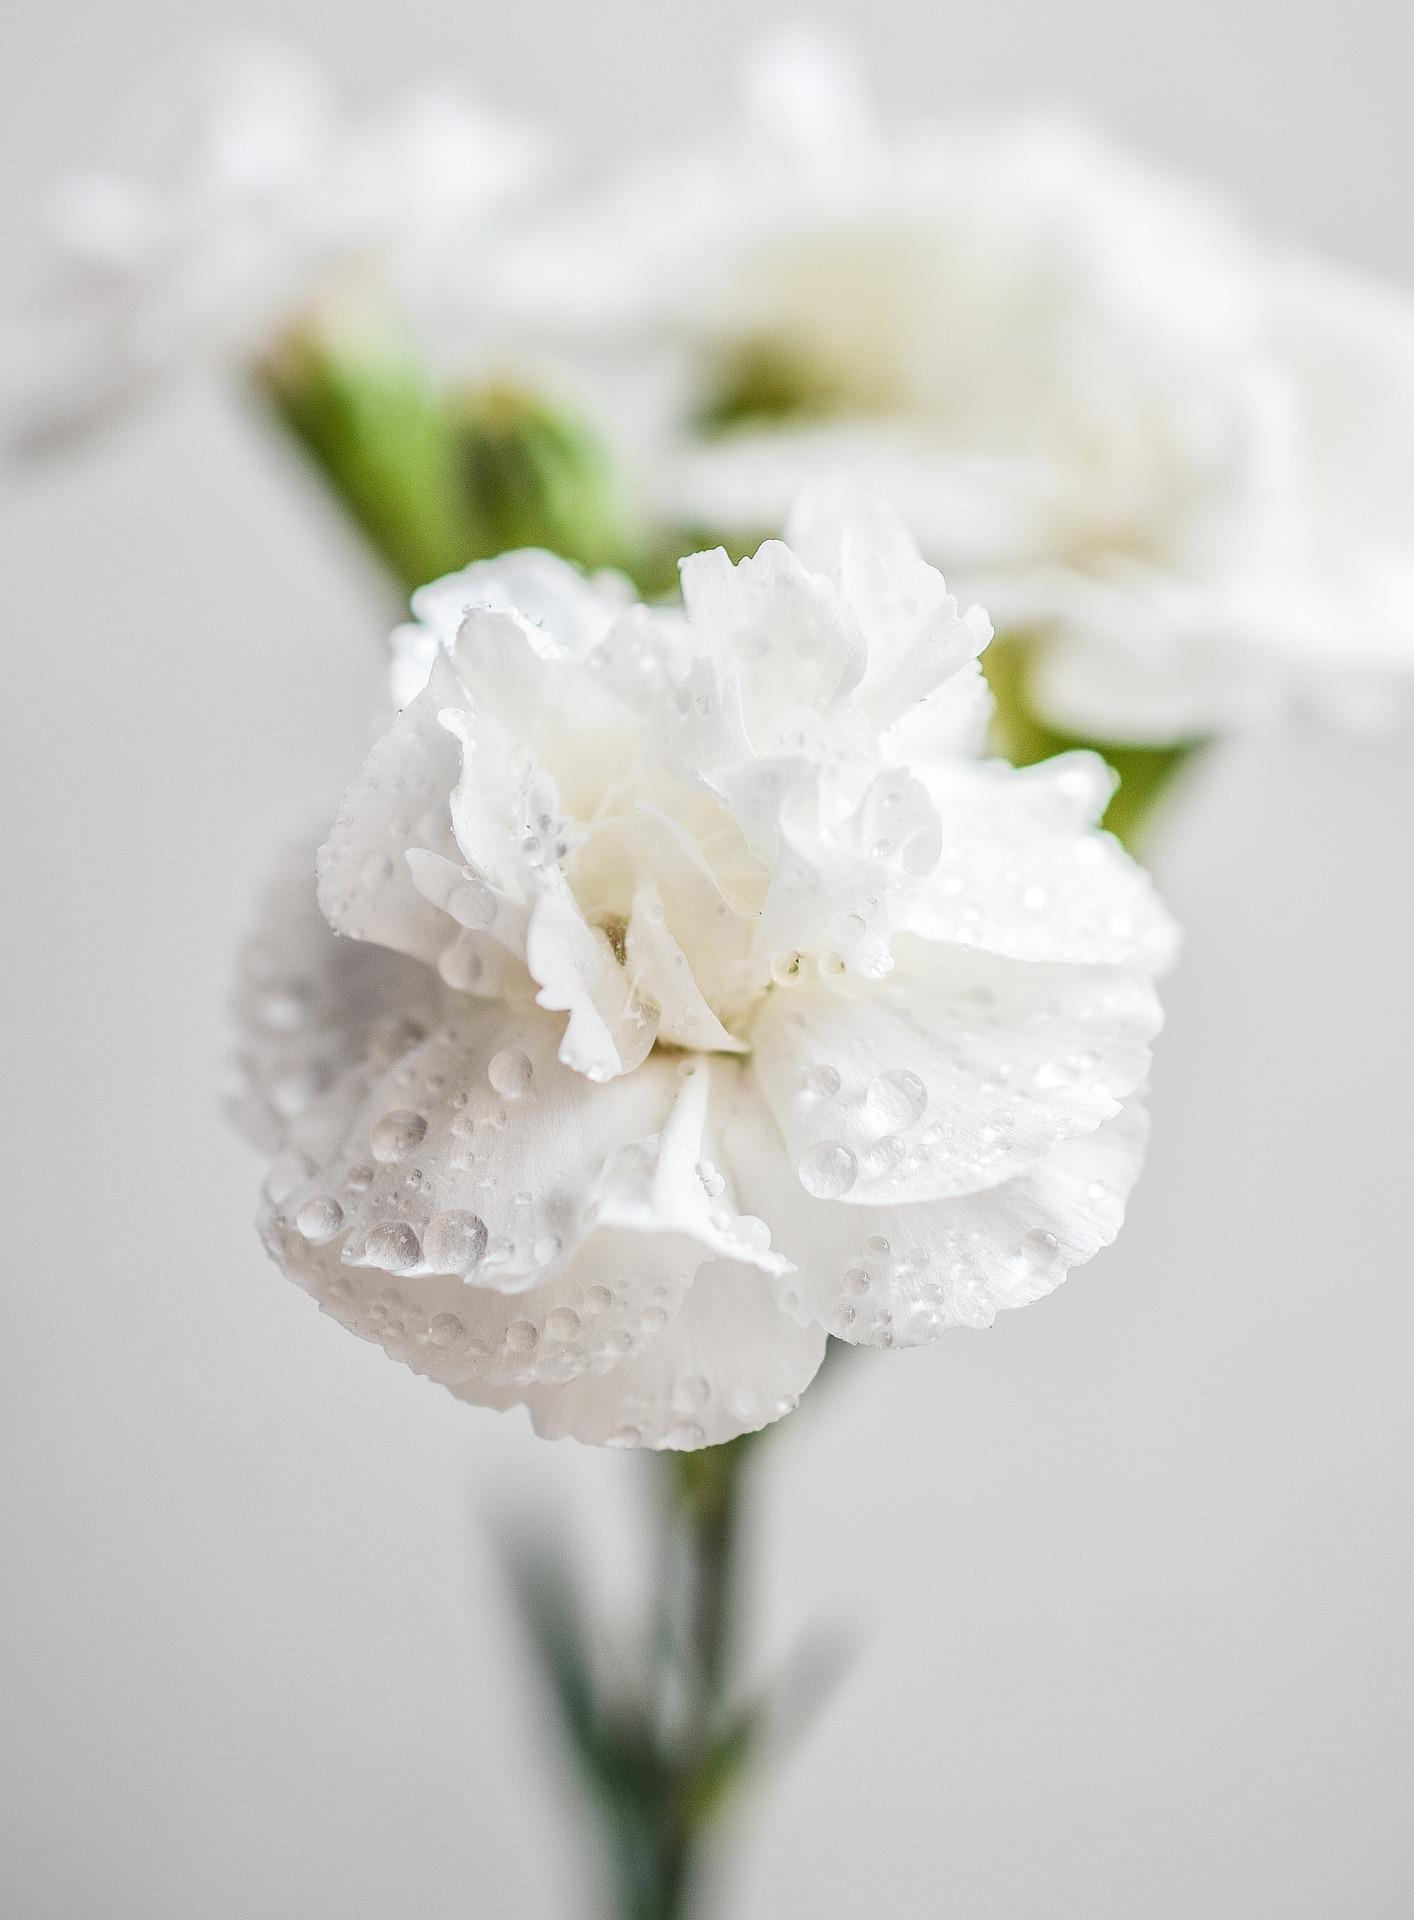 carnation-1426646_1920